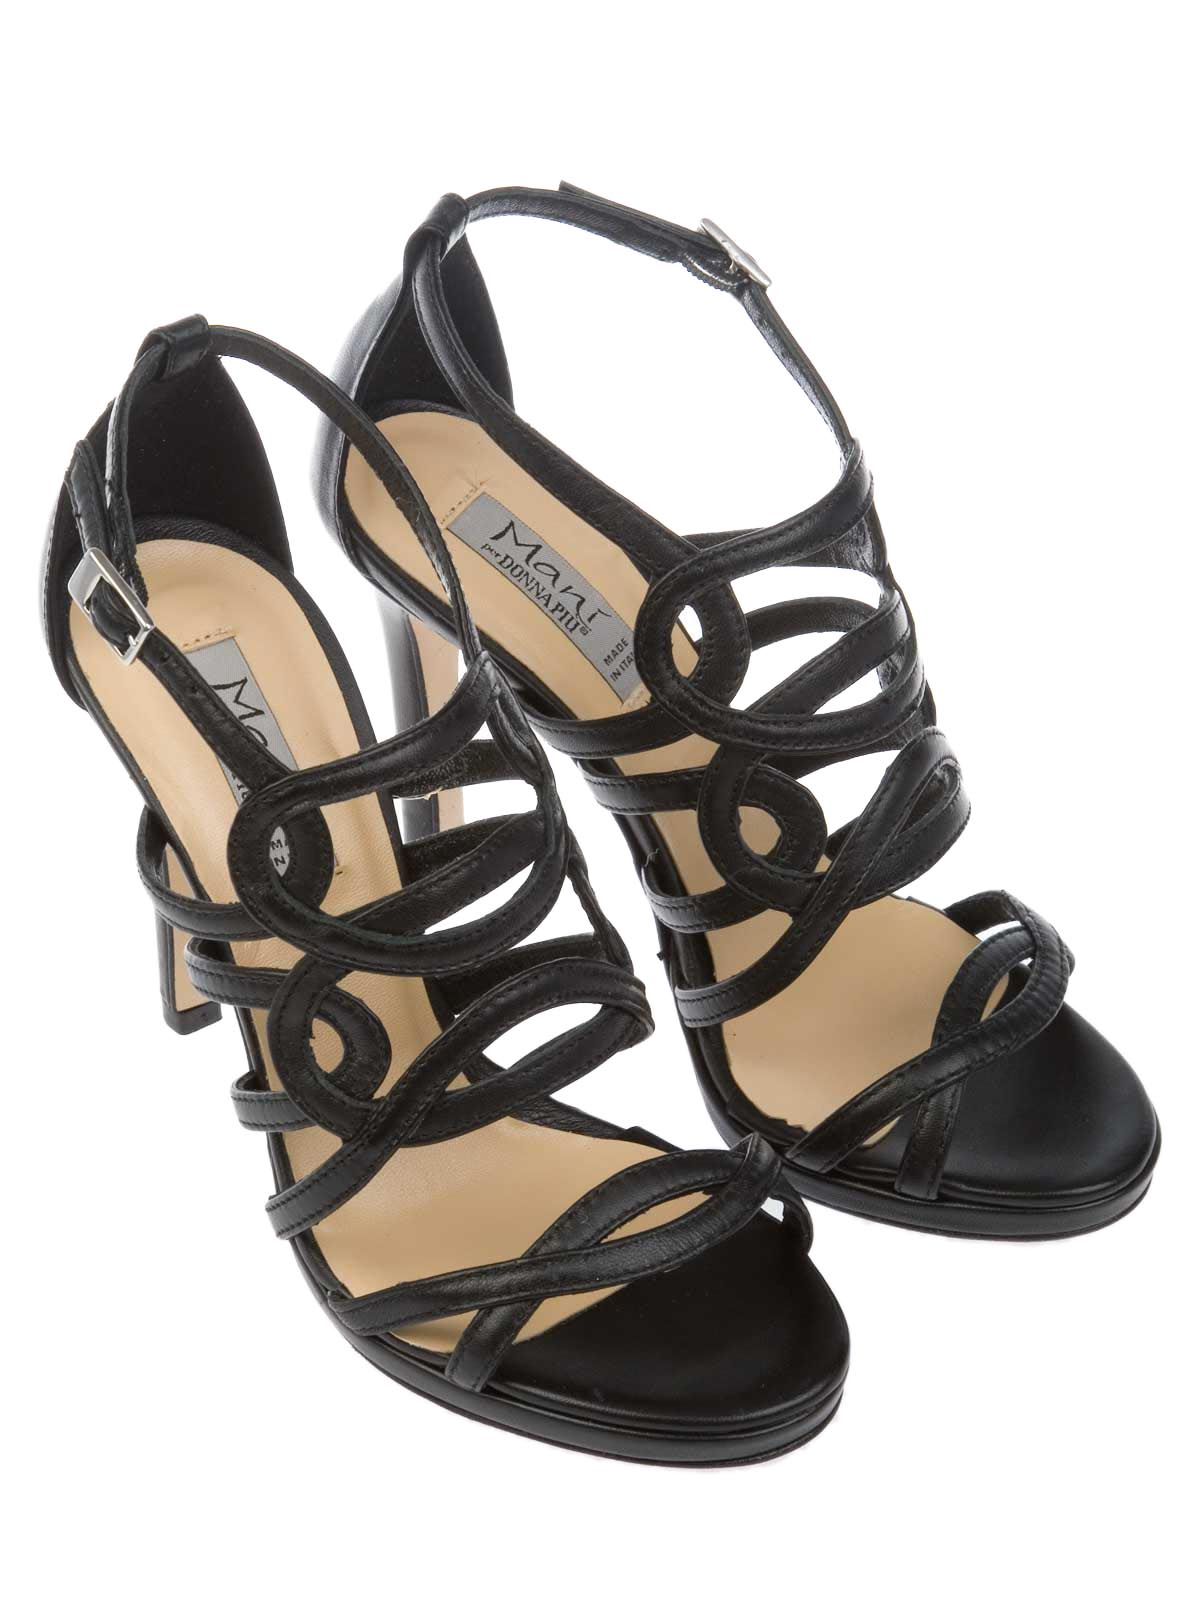 Picture of Donnapiù   Sandal Heel 90